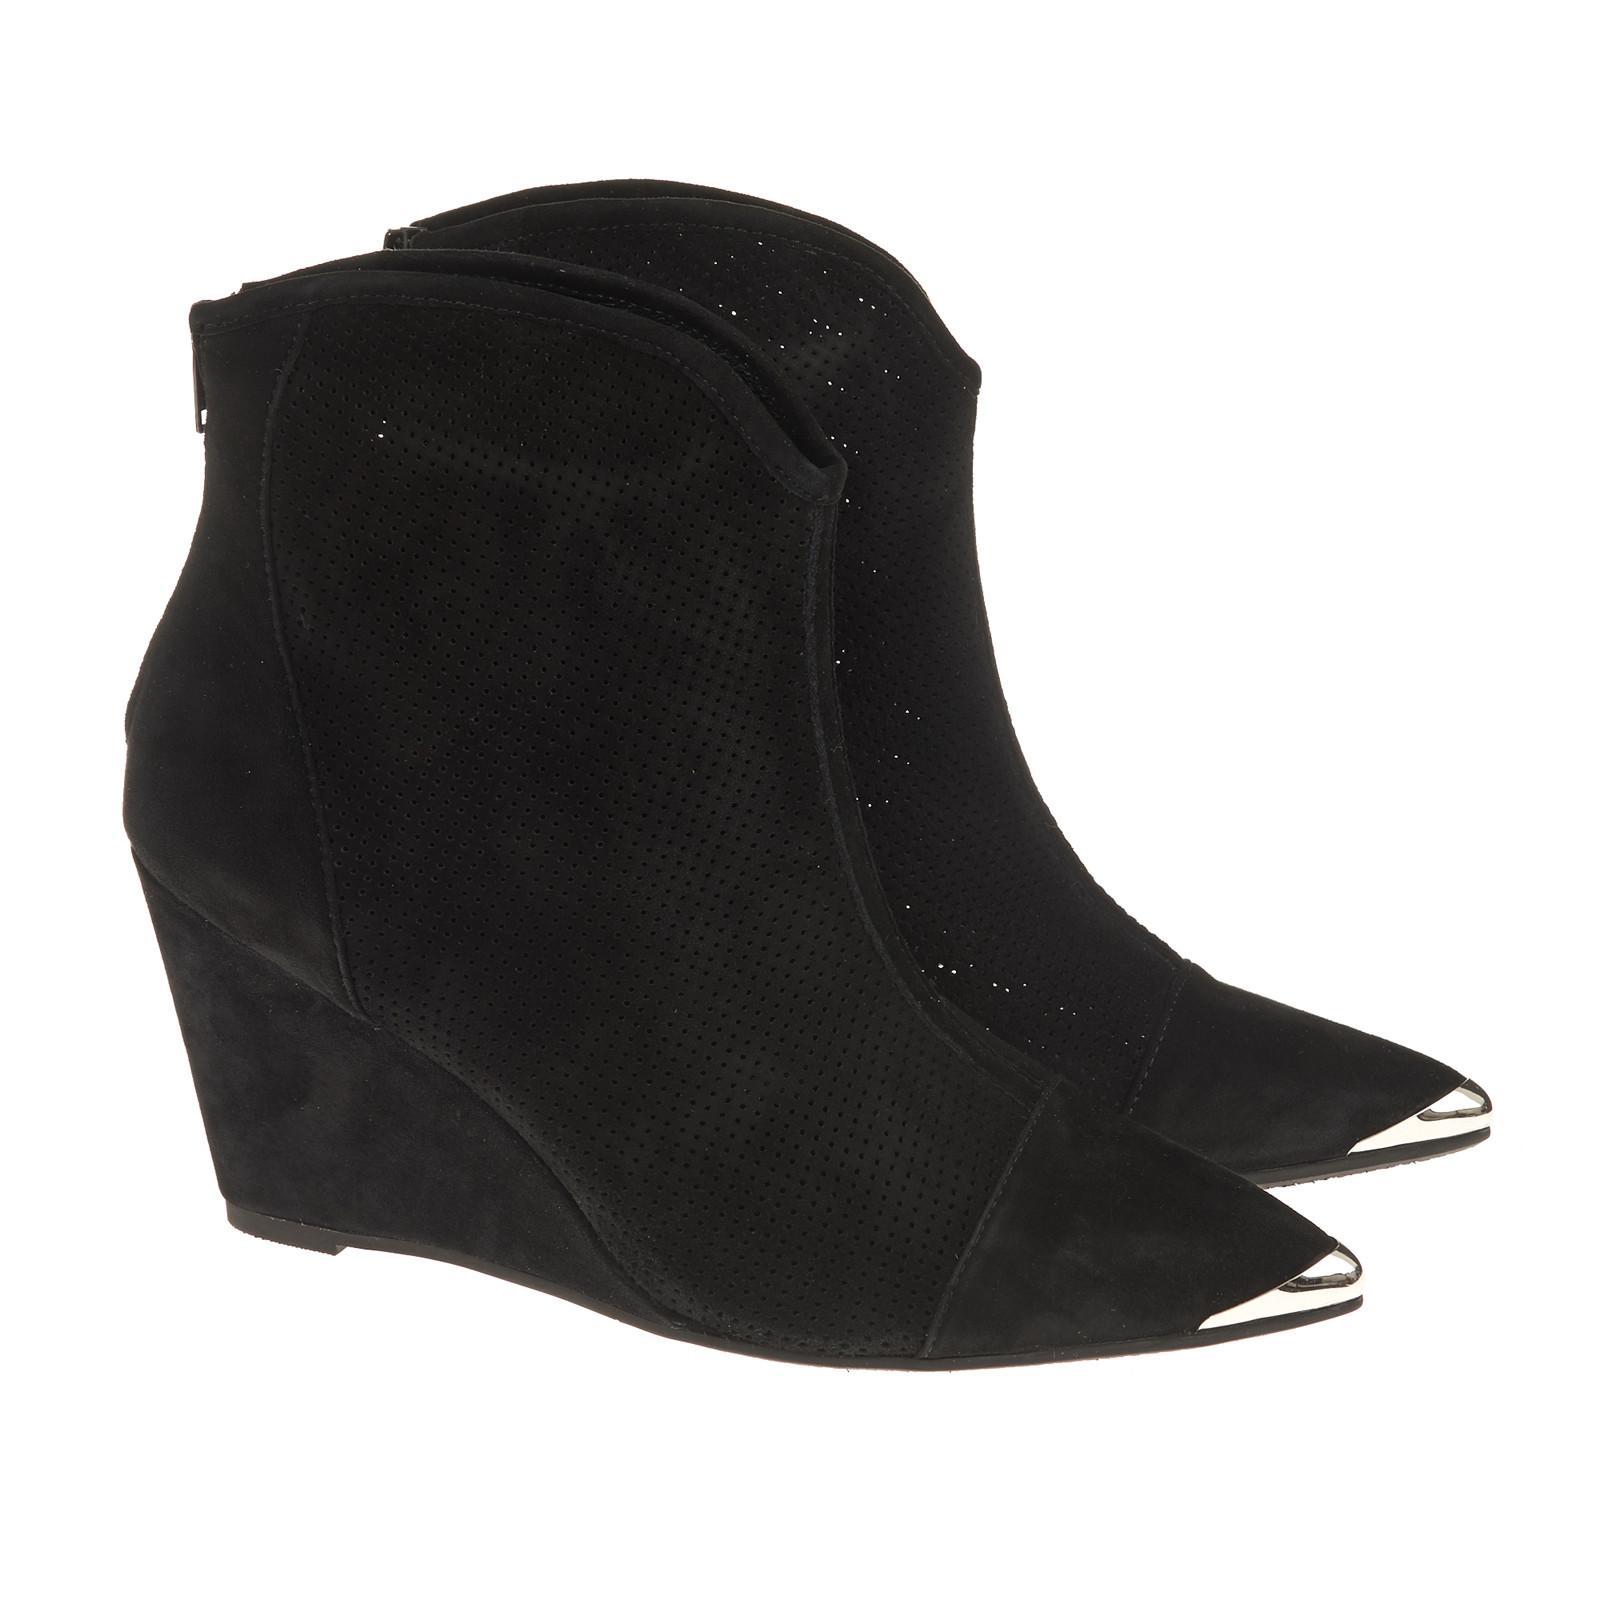 Sofie Schnoor Pointy Boot